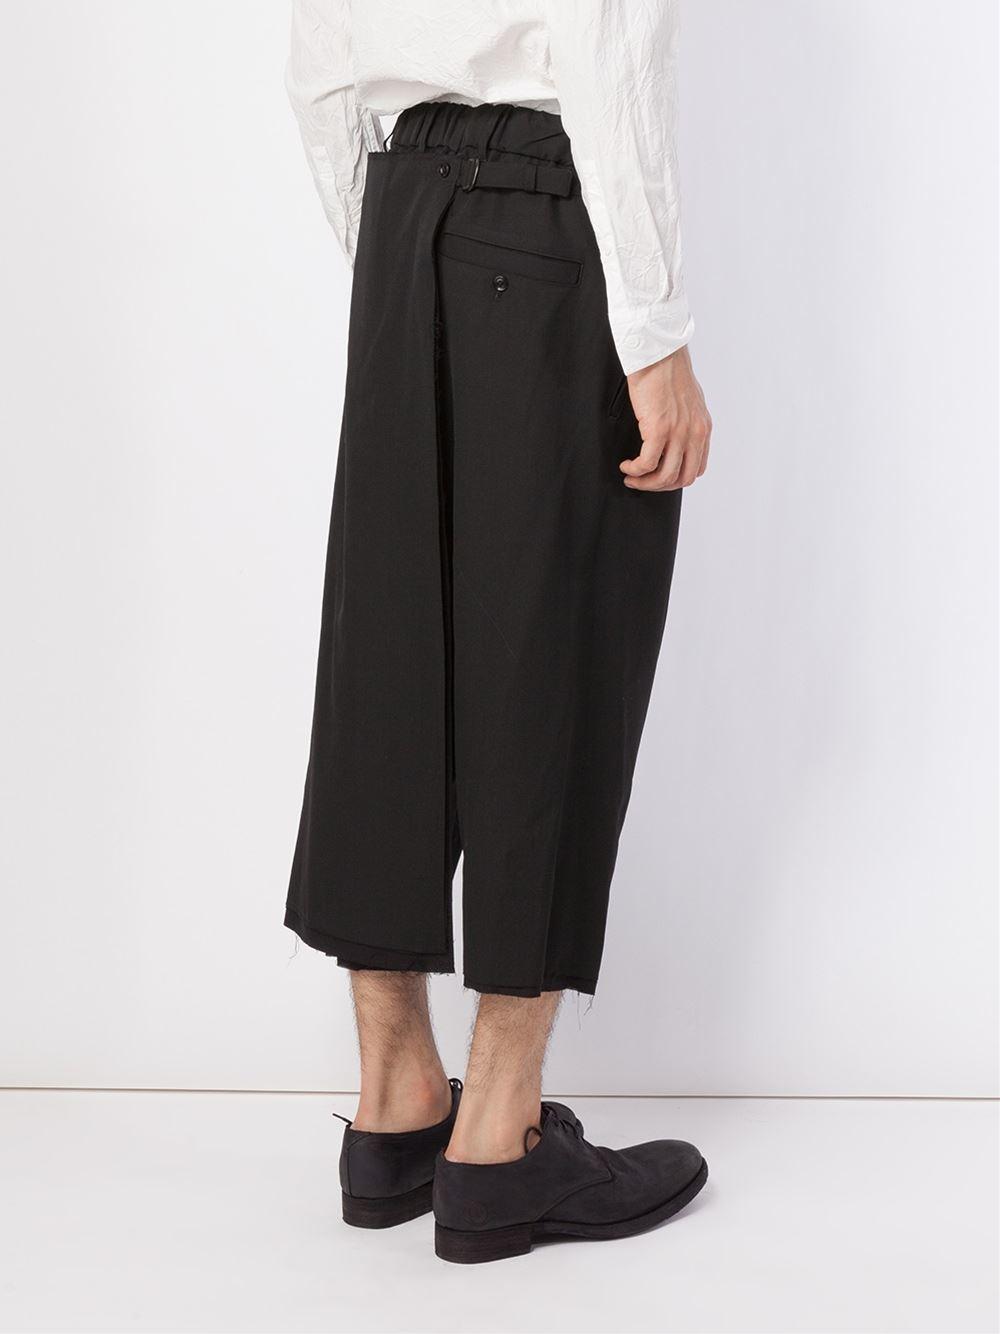 wide leg cropped pants - Black Yohji Yamamoto Enjoy Cheap Online Find Great Online afesYCJp